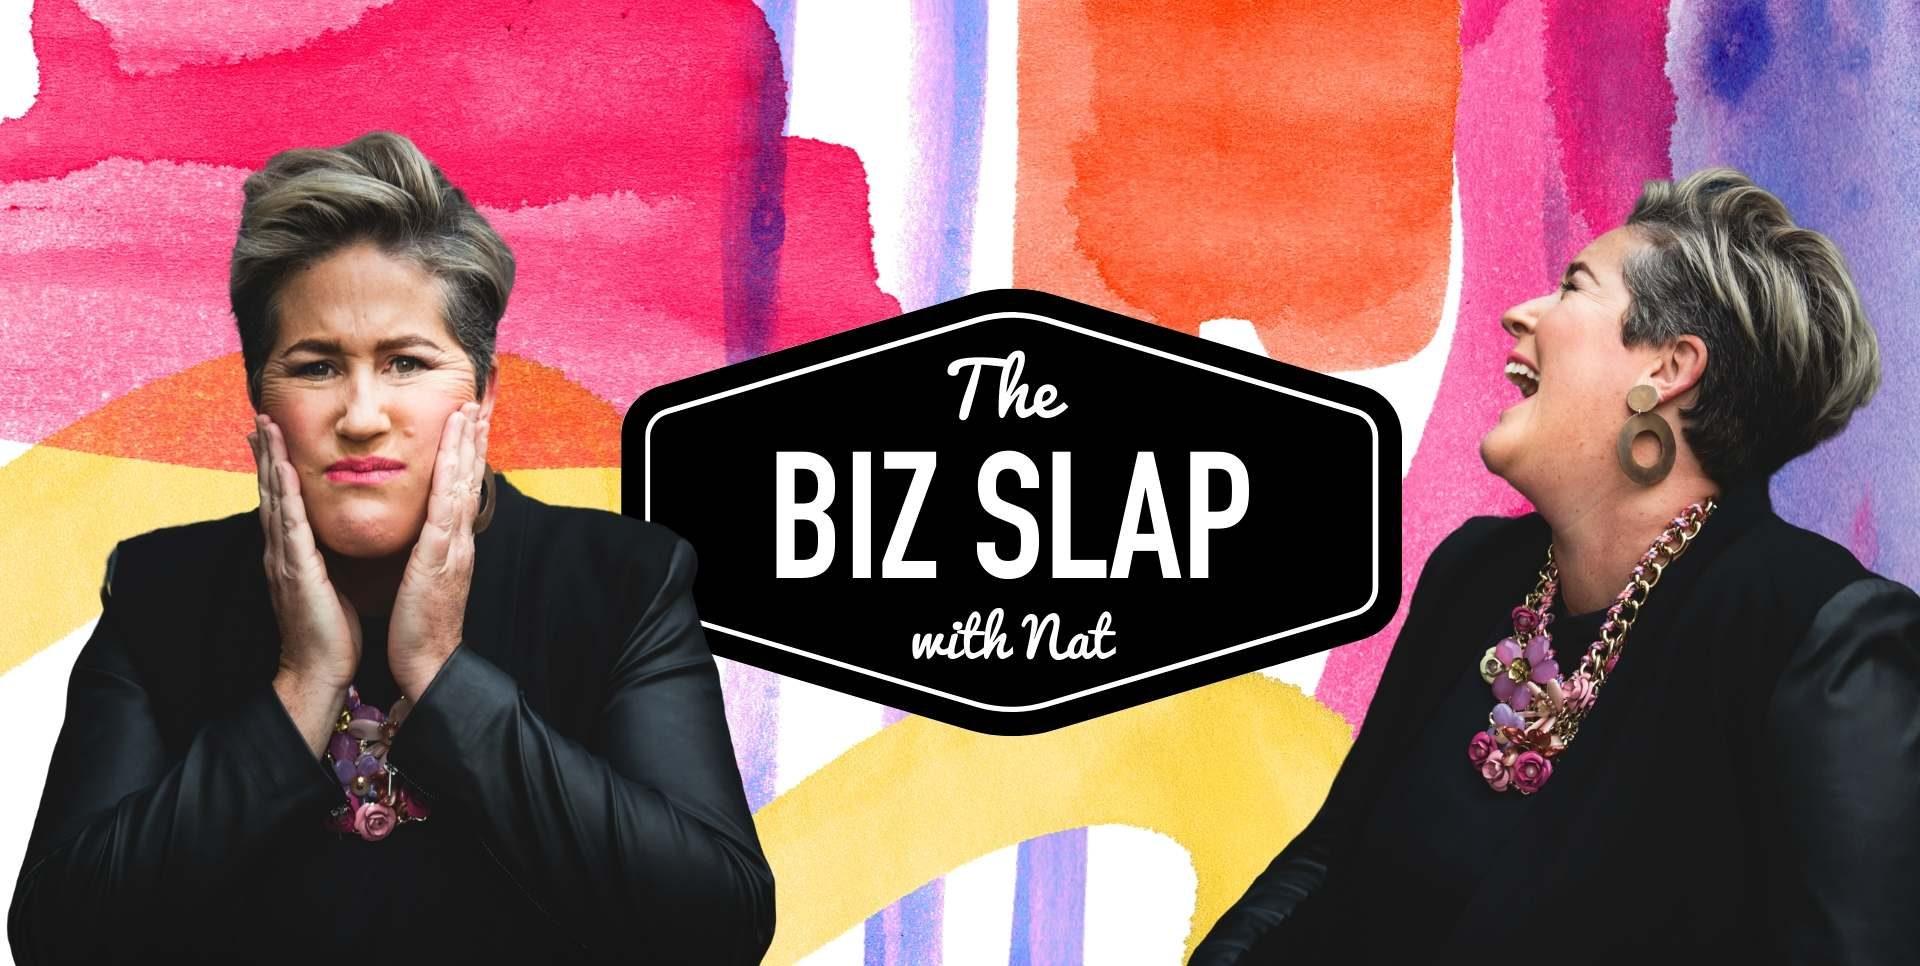 The Biz Slap Accountability Program with Natalie Tolhopf